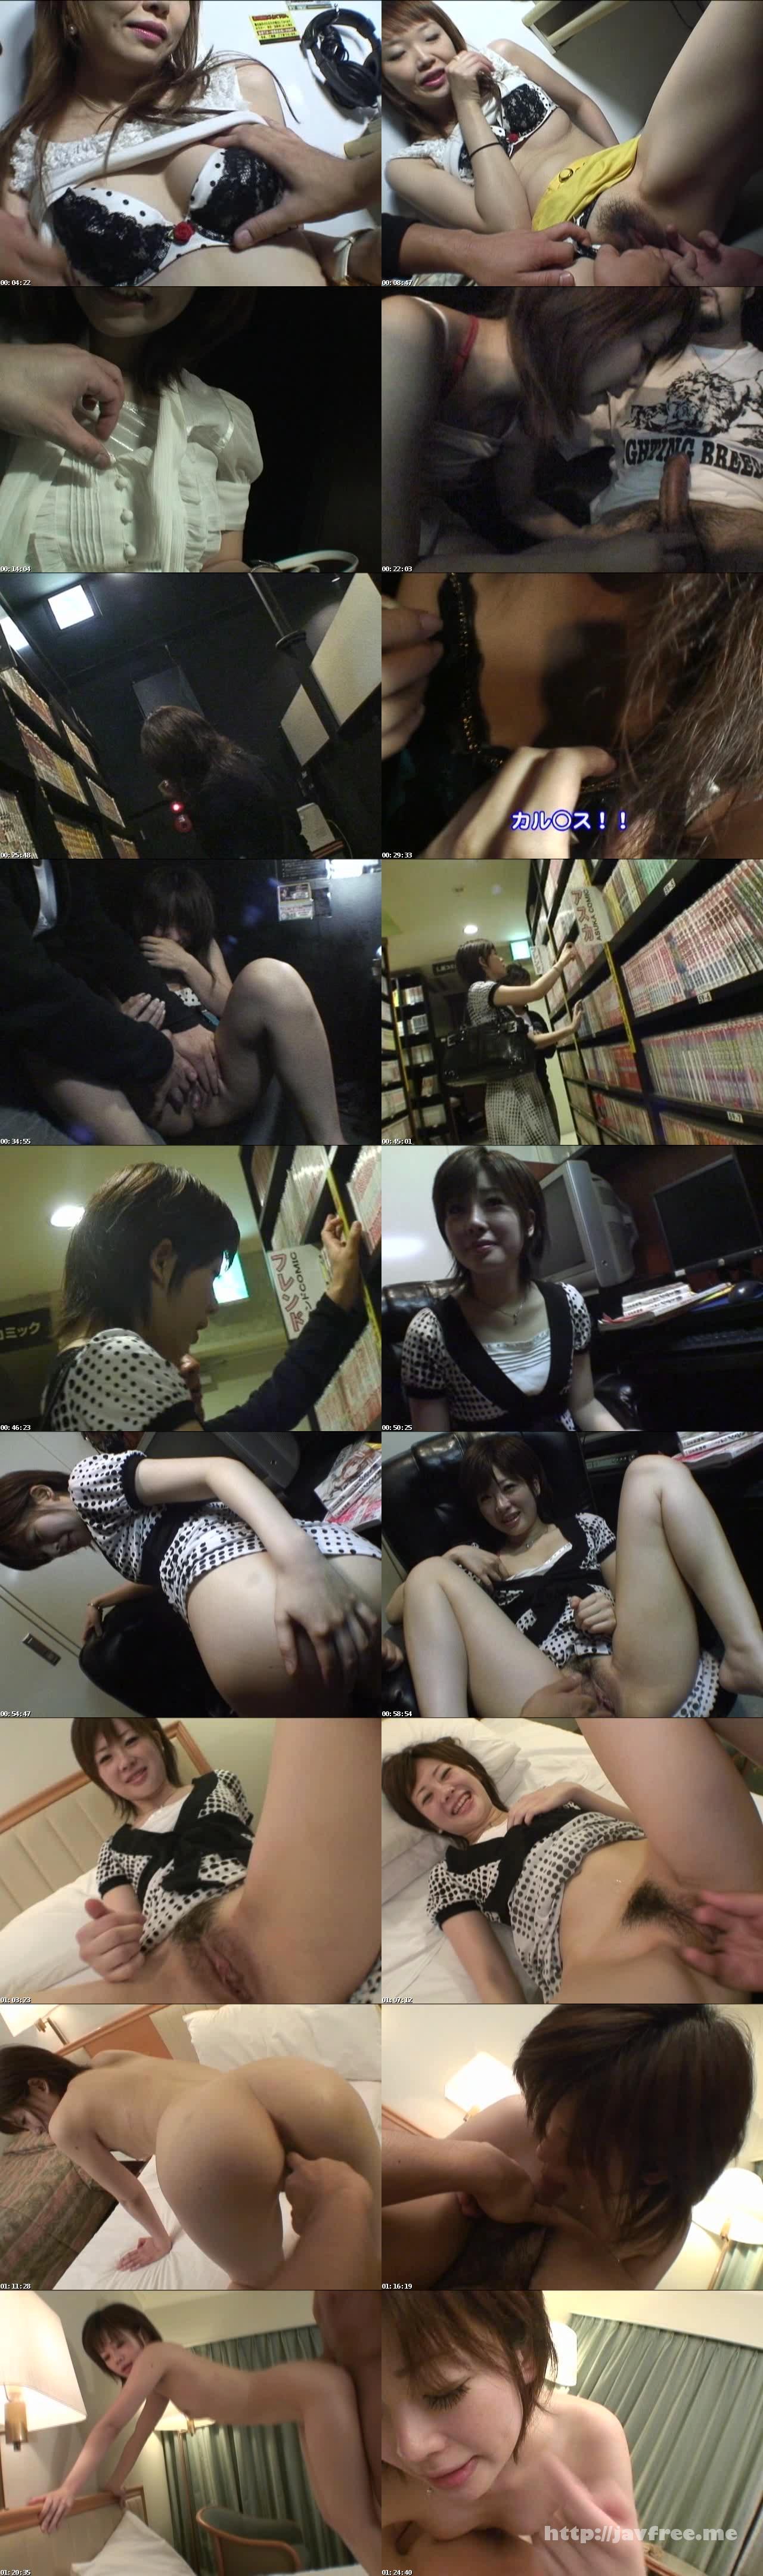 [ST 02] SHI6OTO Vol.2   真夜中のマンガ喫茶はドスケベ素人連れ込んでやりたい放題! Vol.2 ST